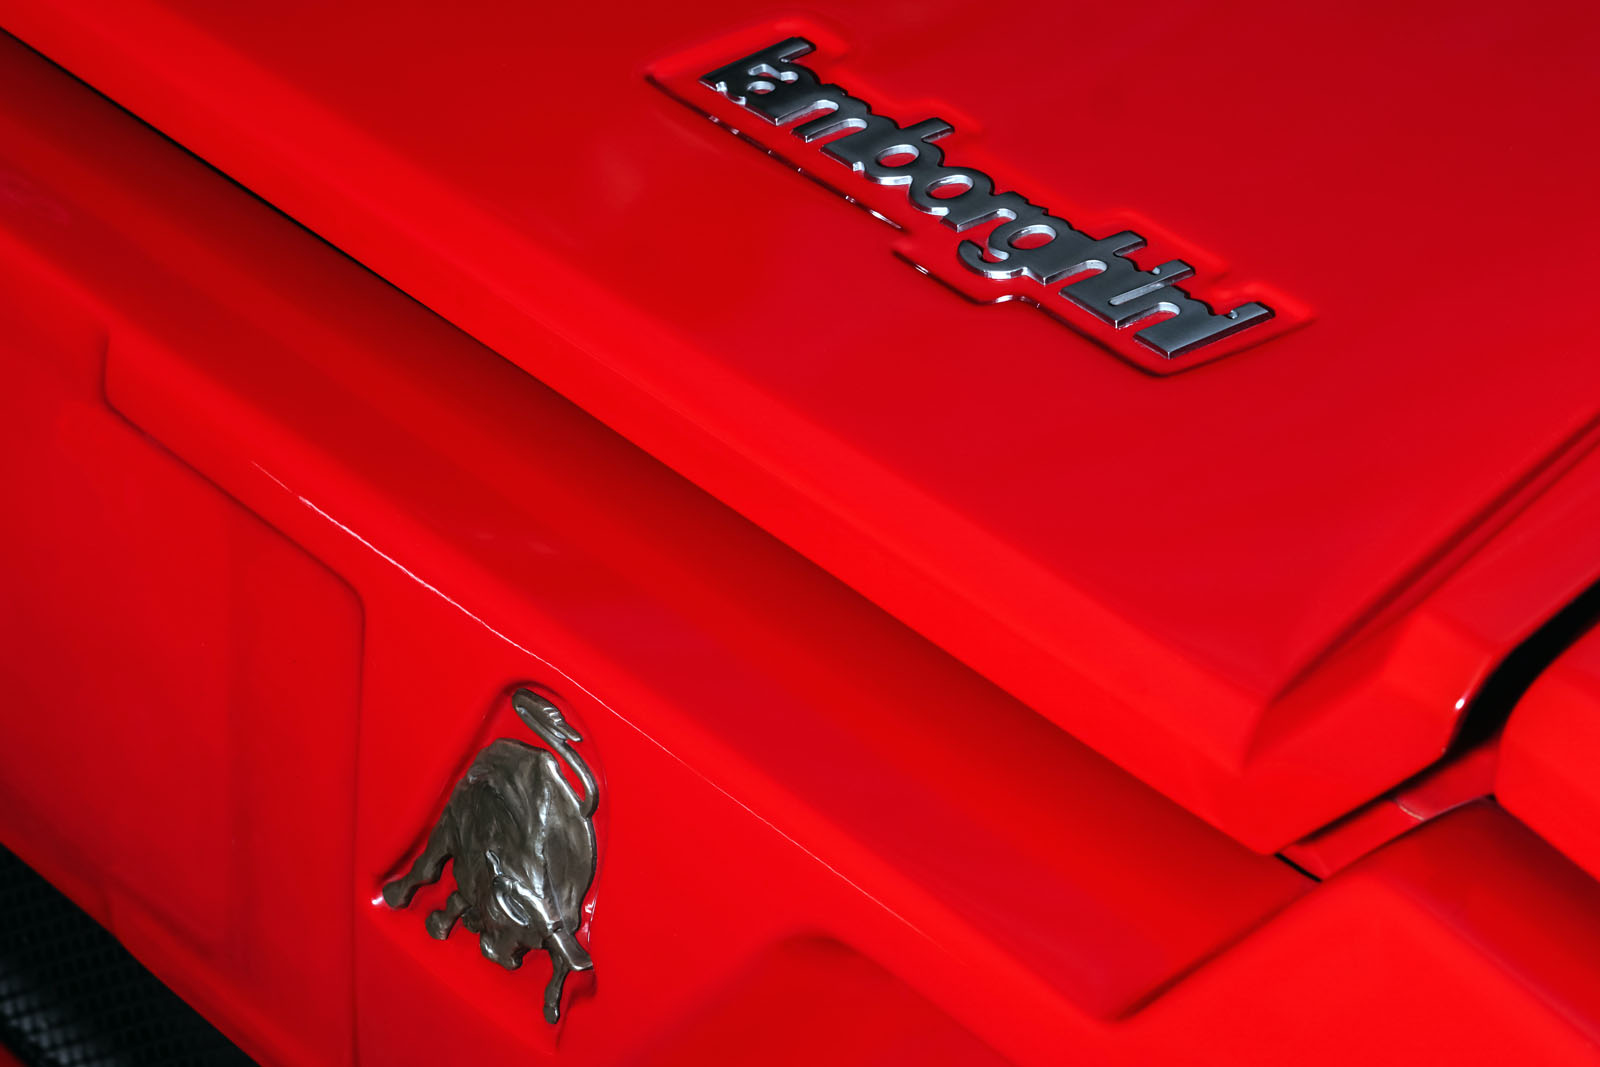 Lamborghini_Countach_Rot_Schwarz_LAM-2811_22_w